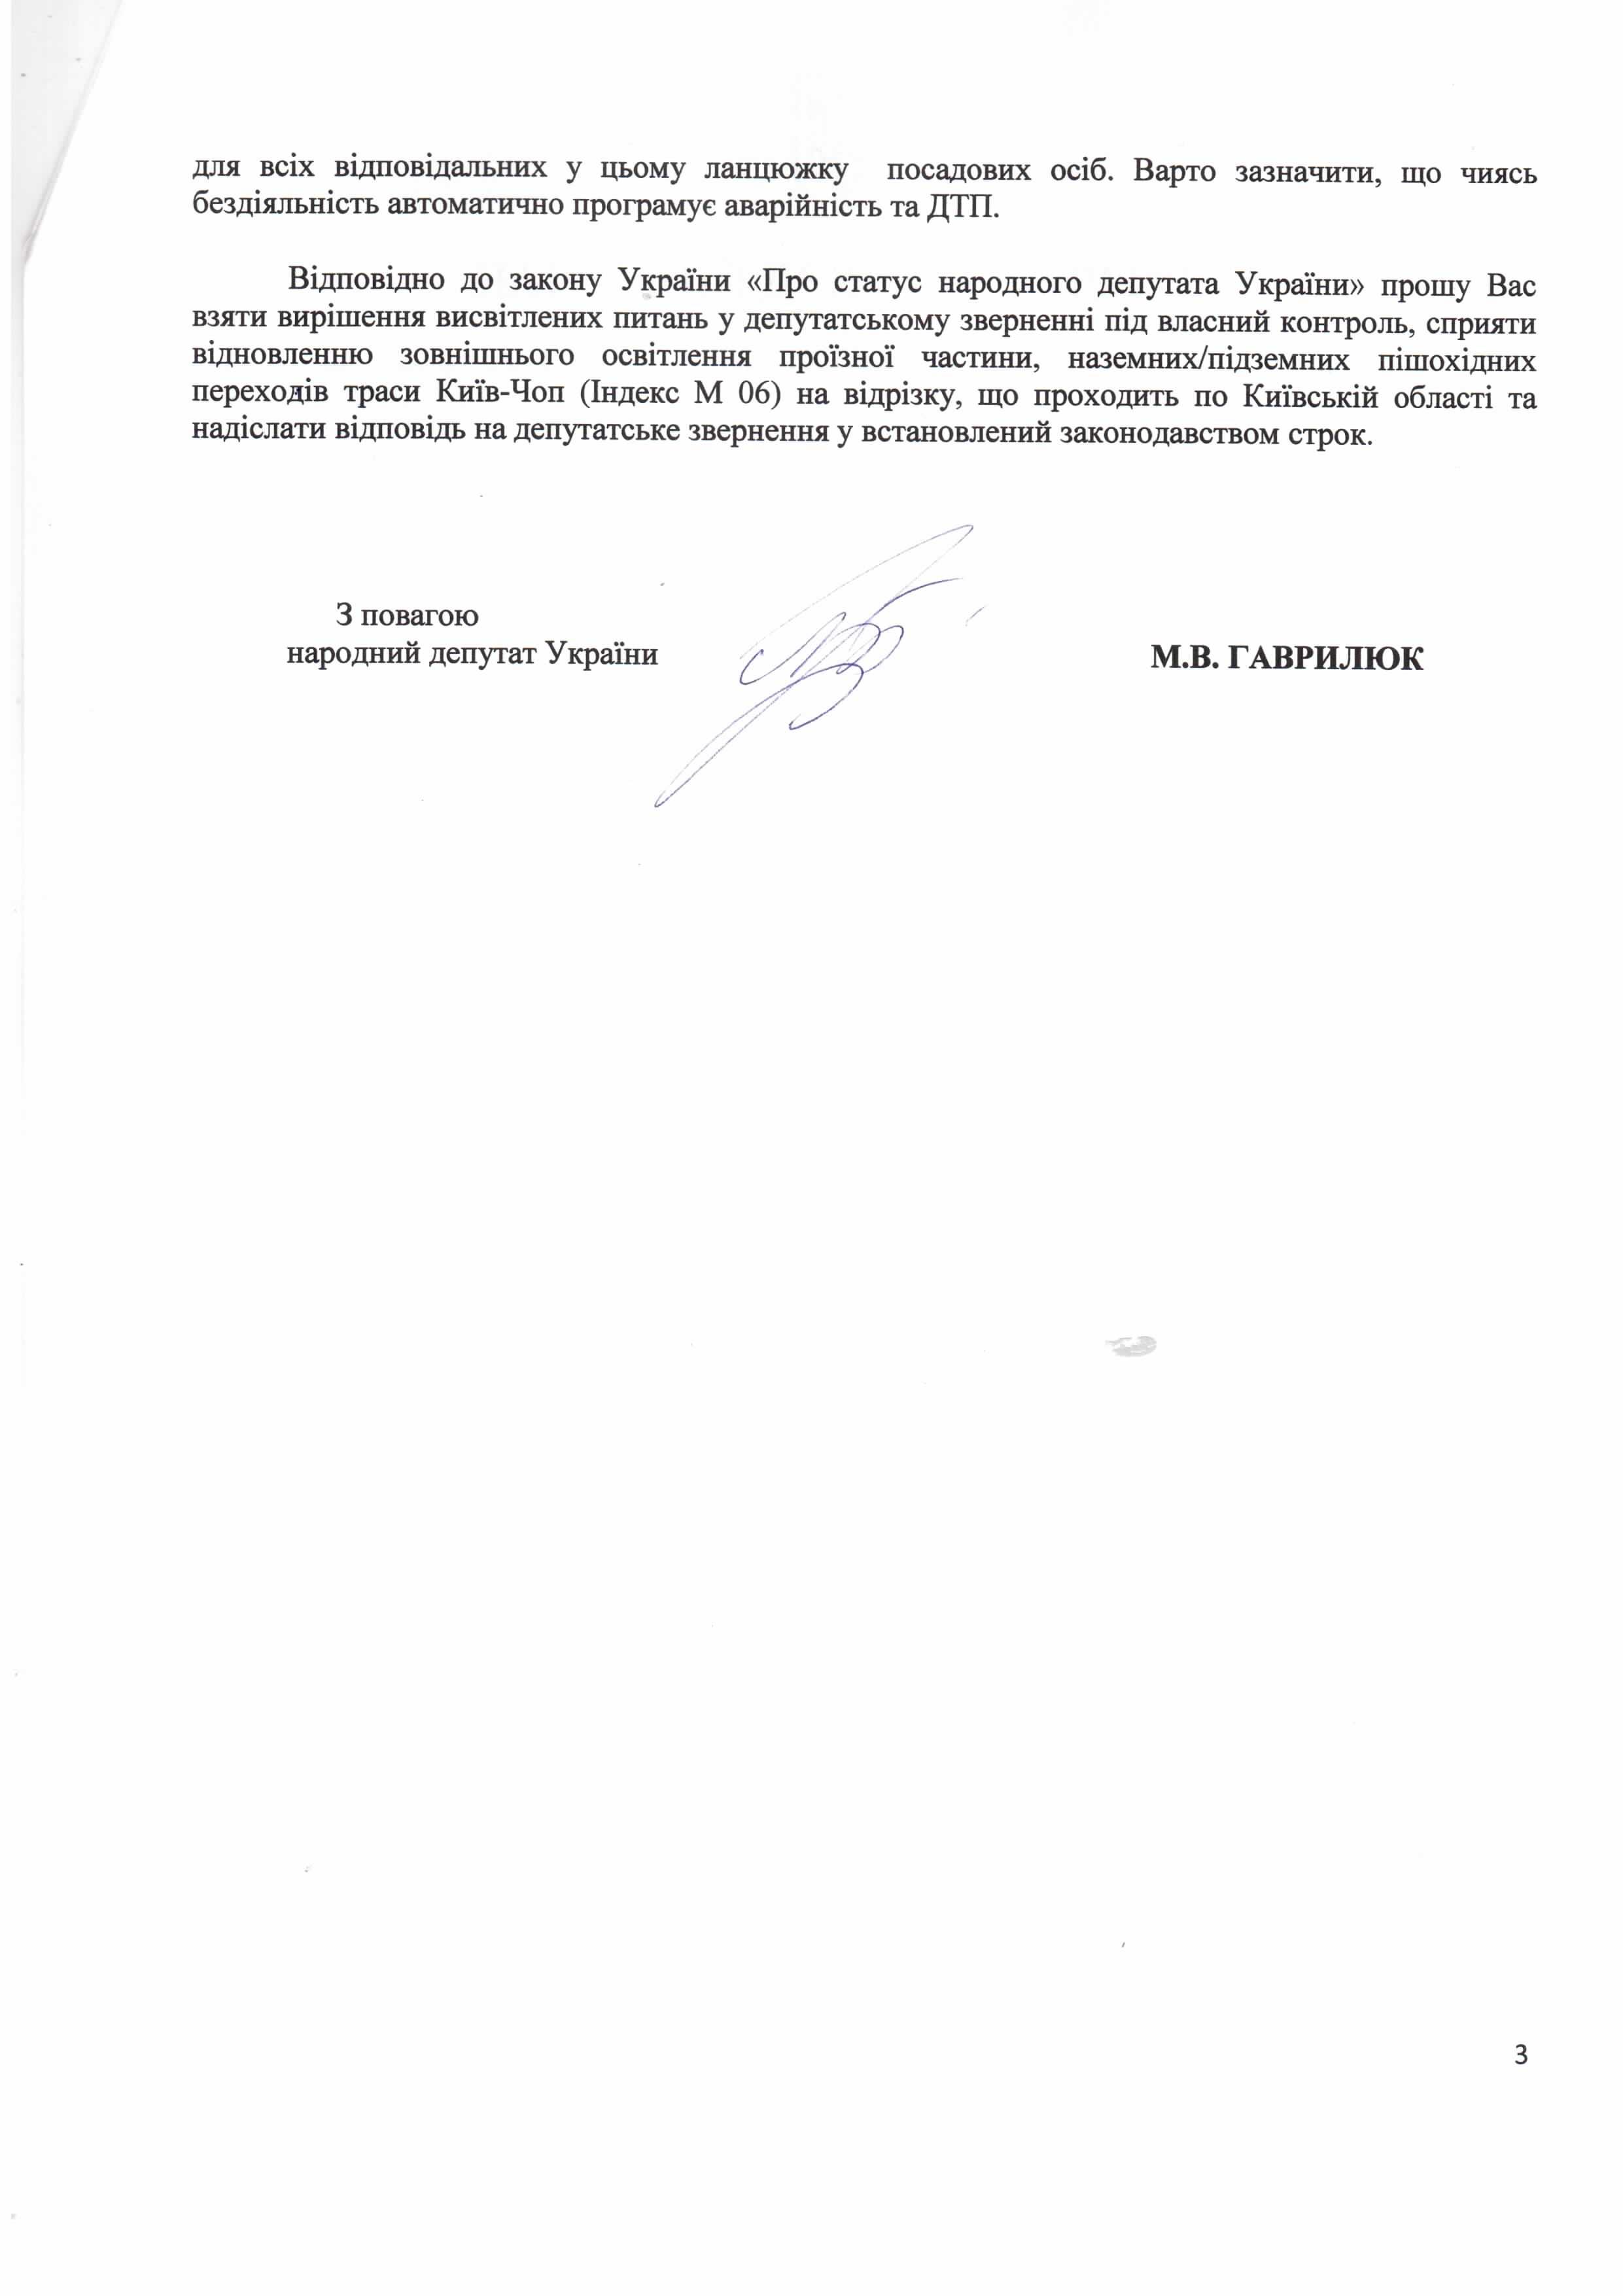 Депут Зверн. Гаврилюка по тр Киъв-Чоп_3